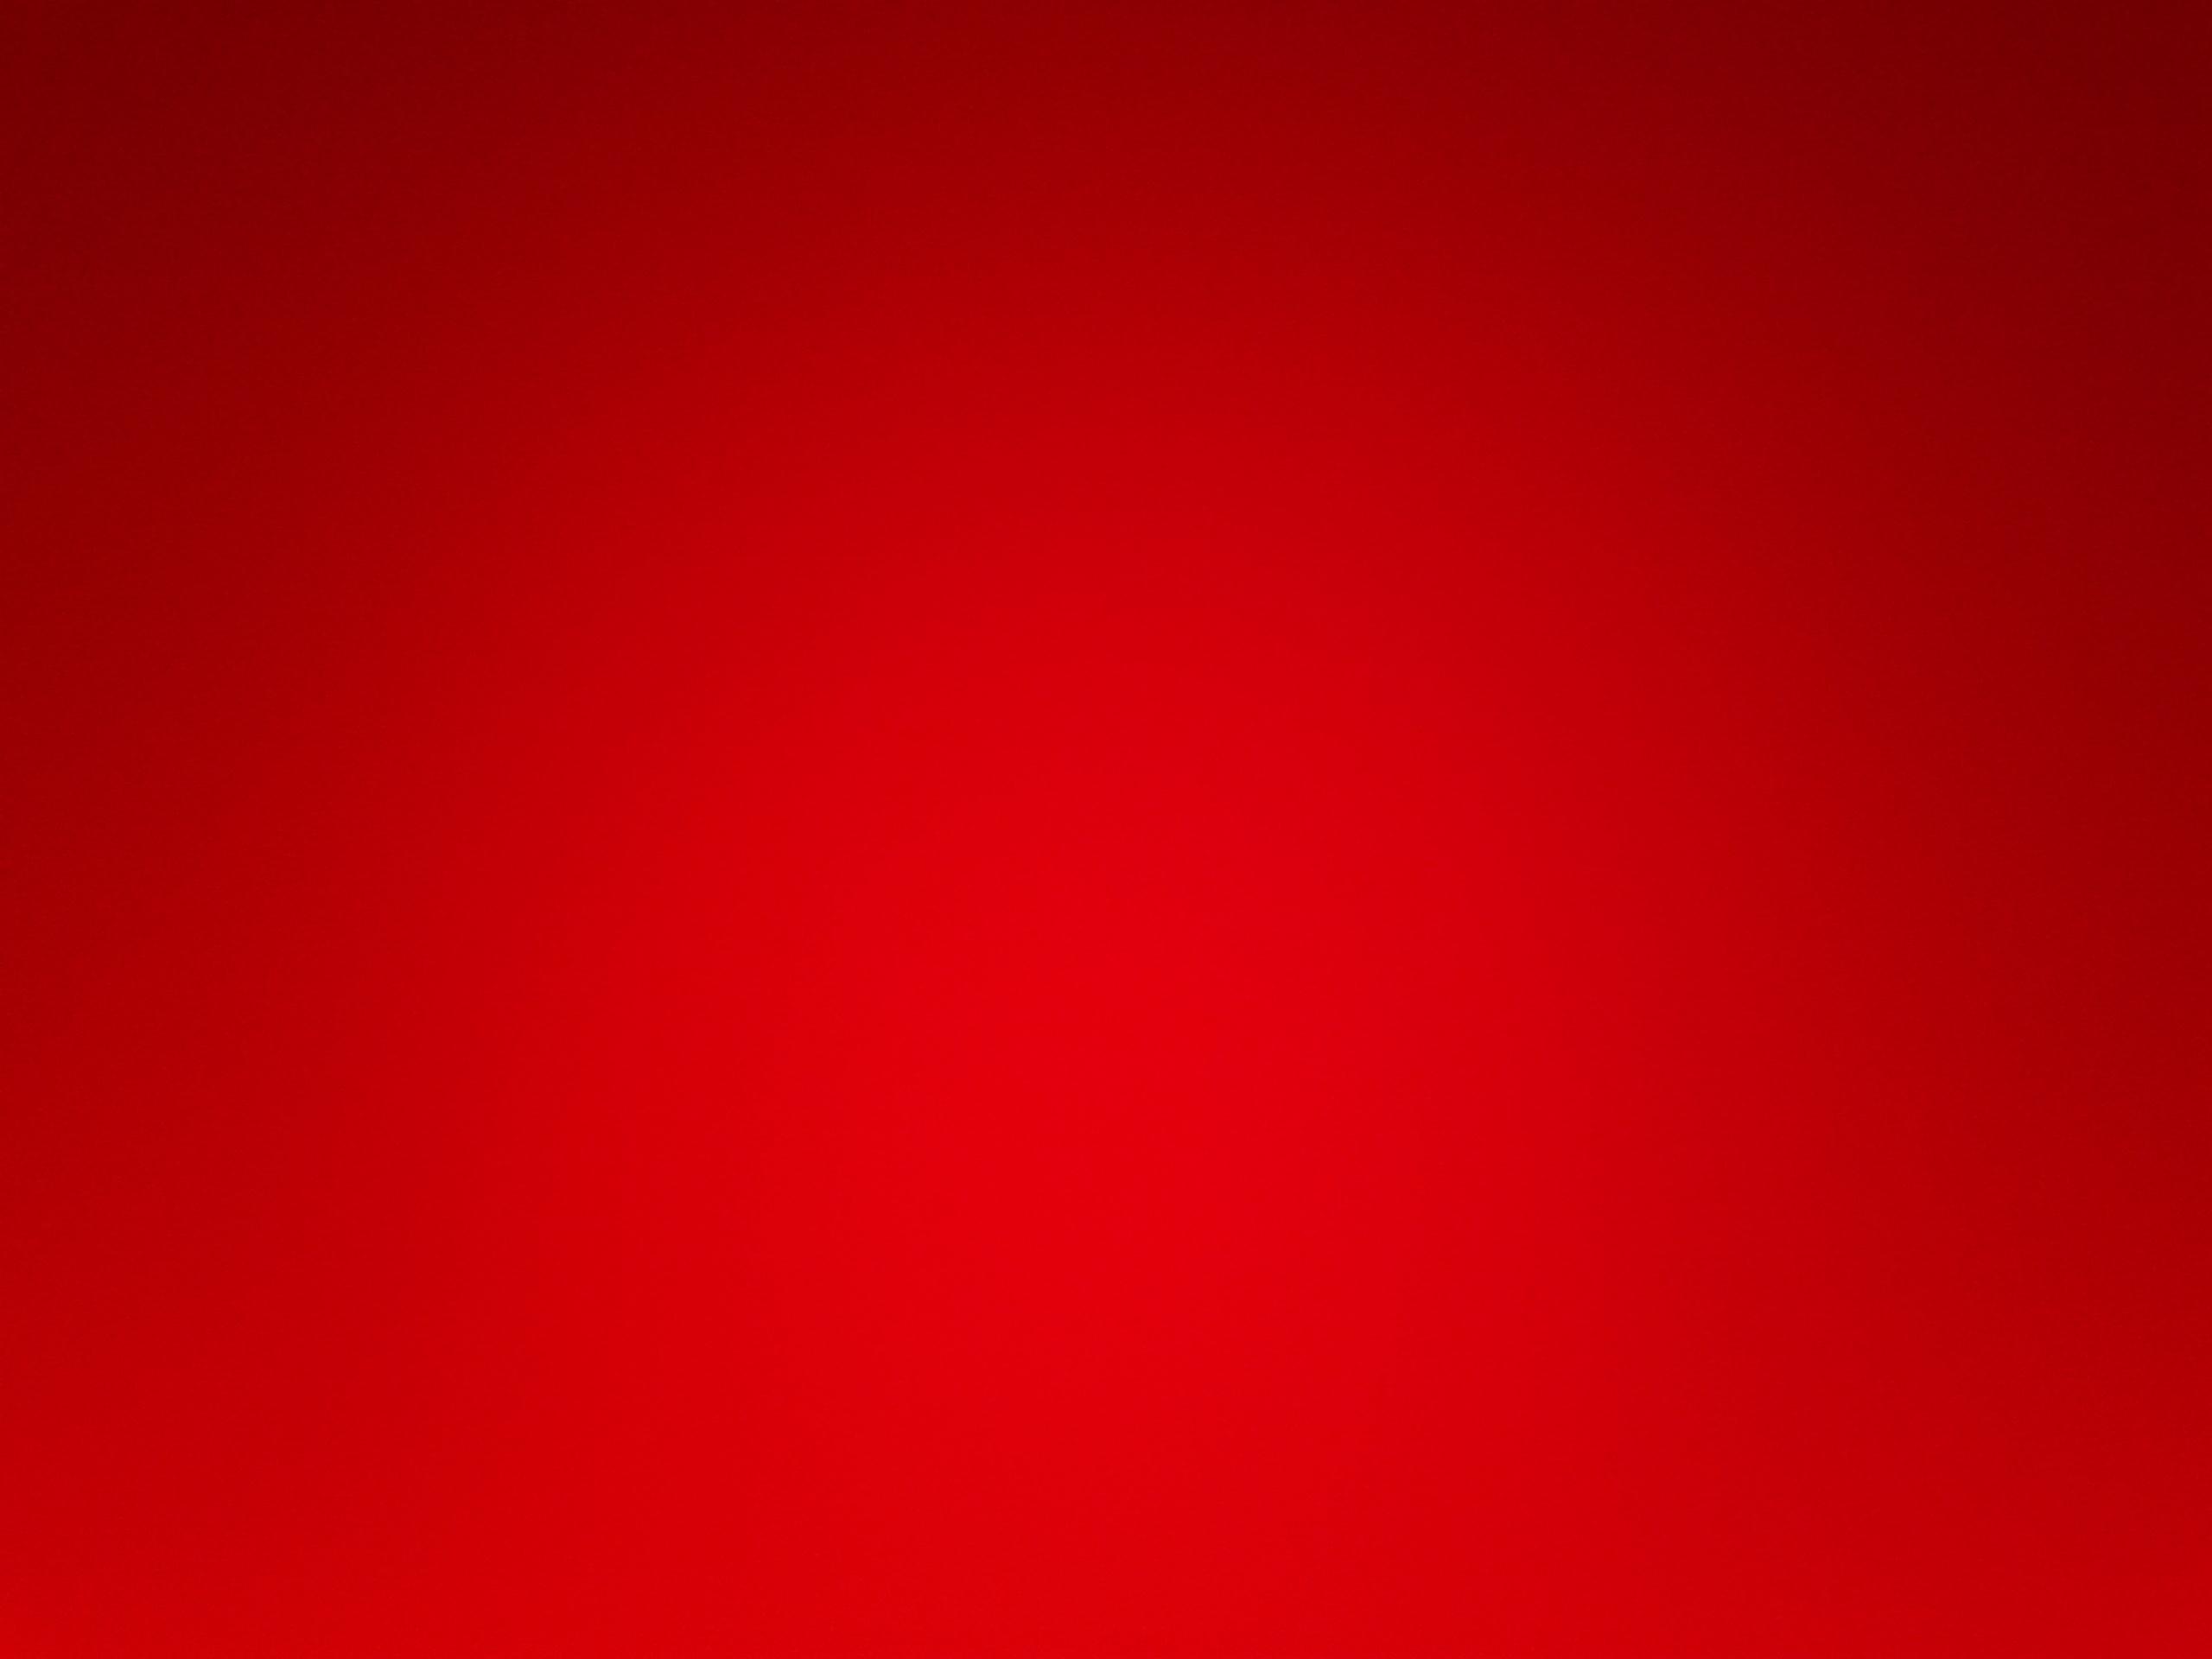 red wallpaper 2560x1920 44519